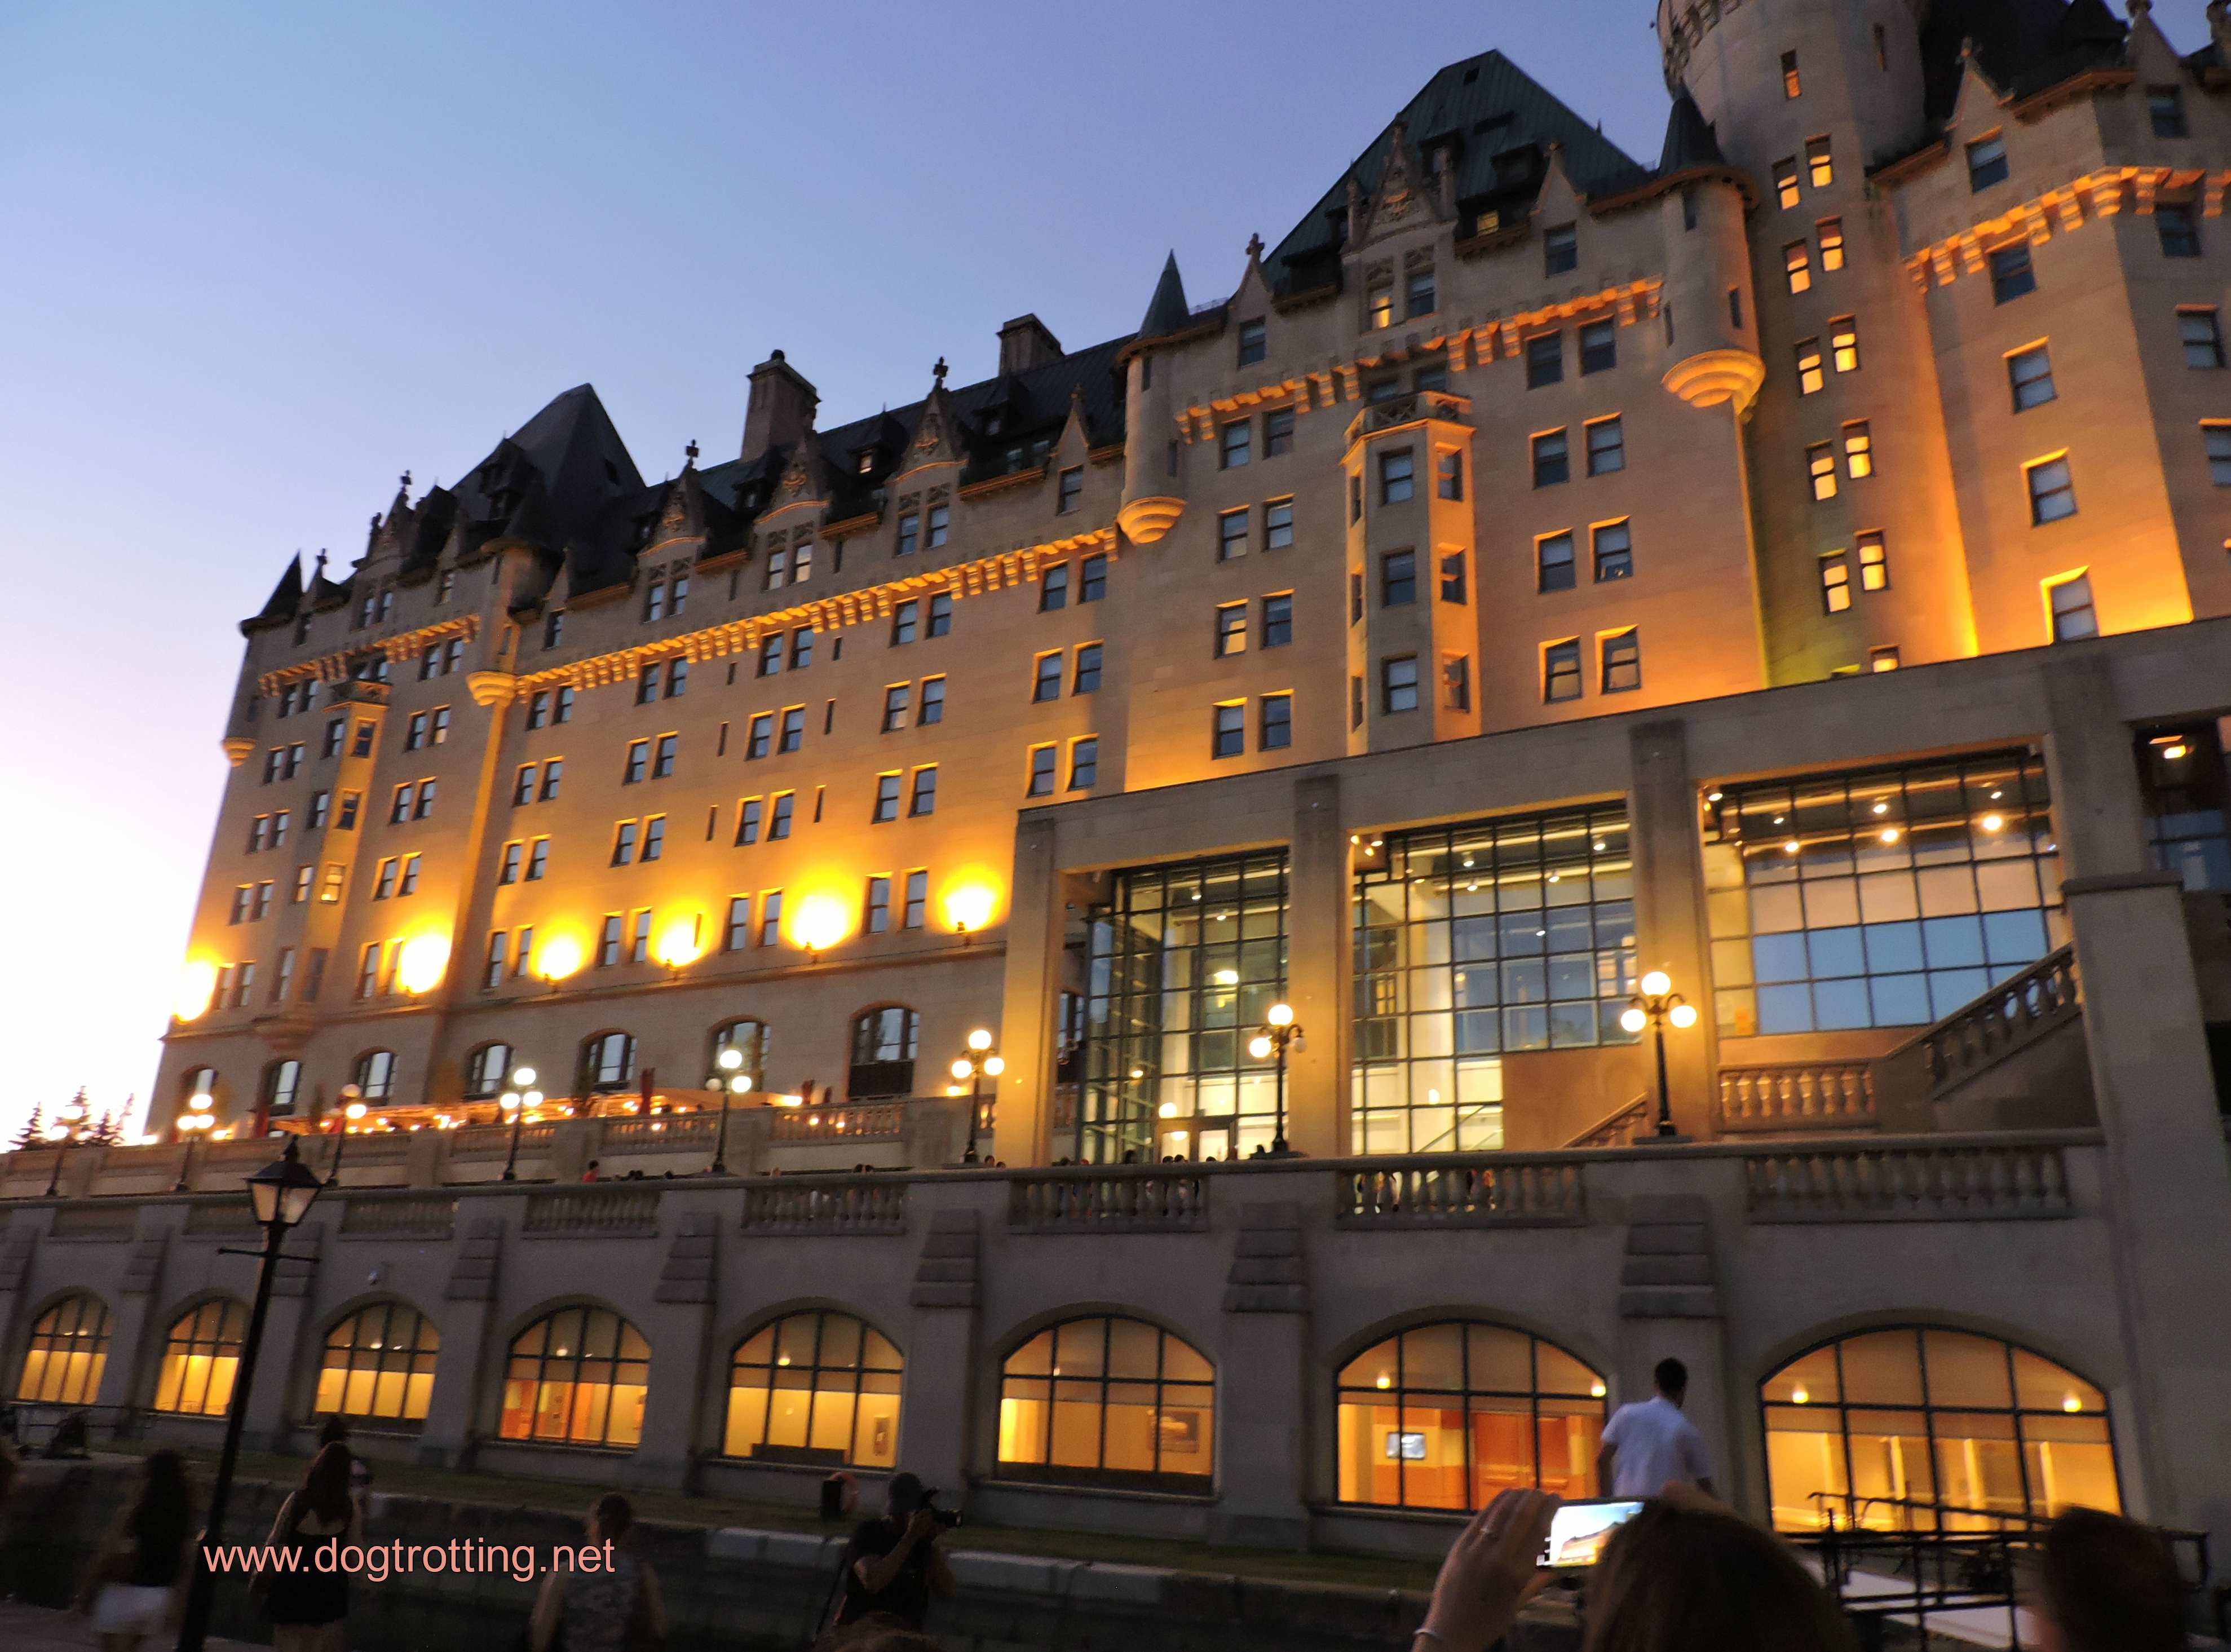 Fairmount Hotel Ottawa after dark on Haunted Walk Tour